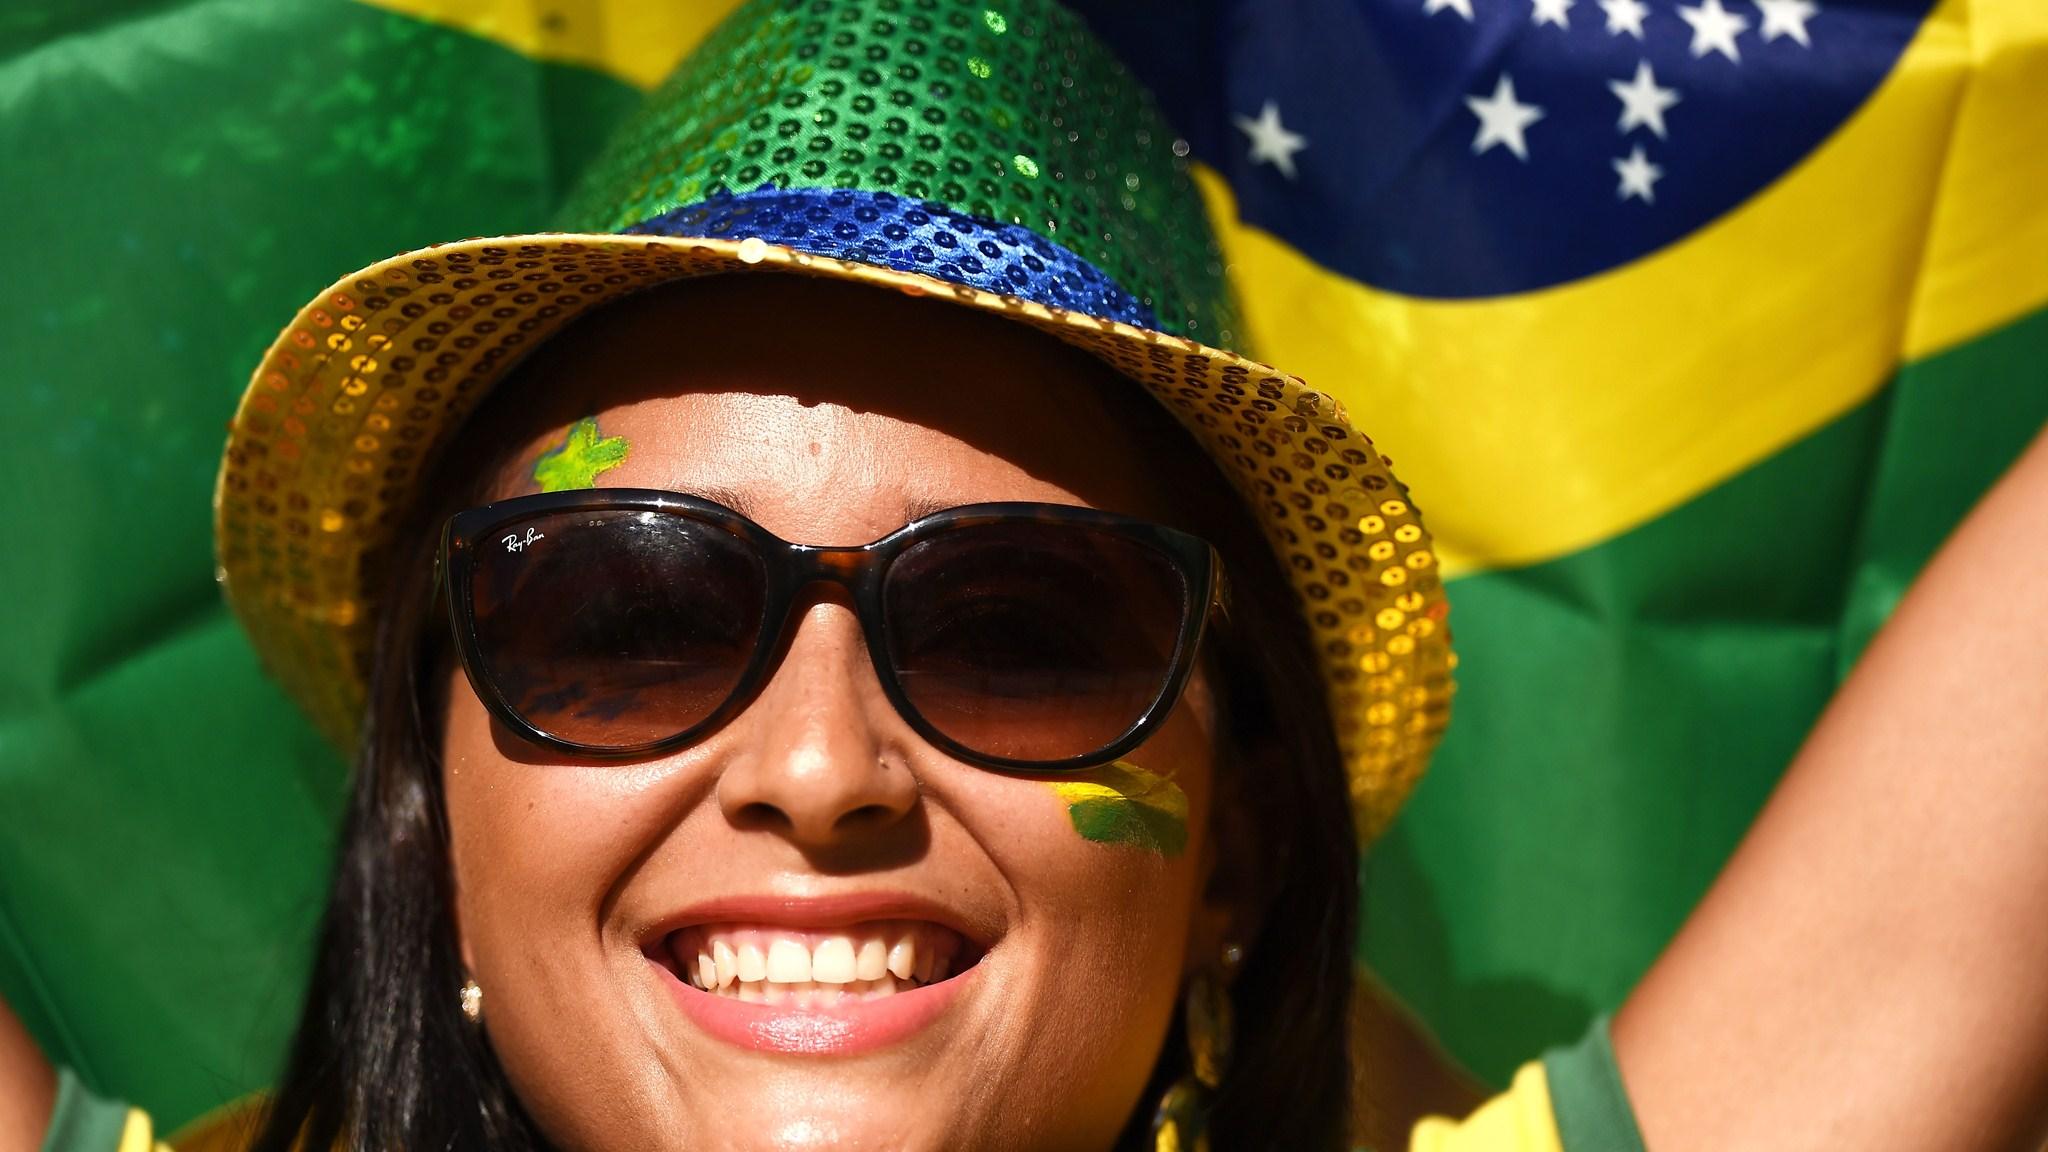 252 - Brazil-Colombia [2-1] -- 04 Jul 2014 - 17-00 - kuaza